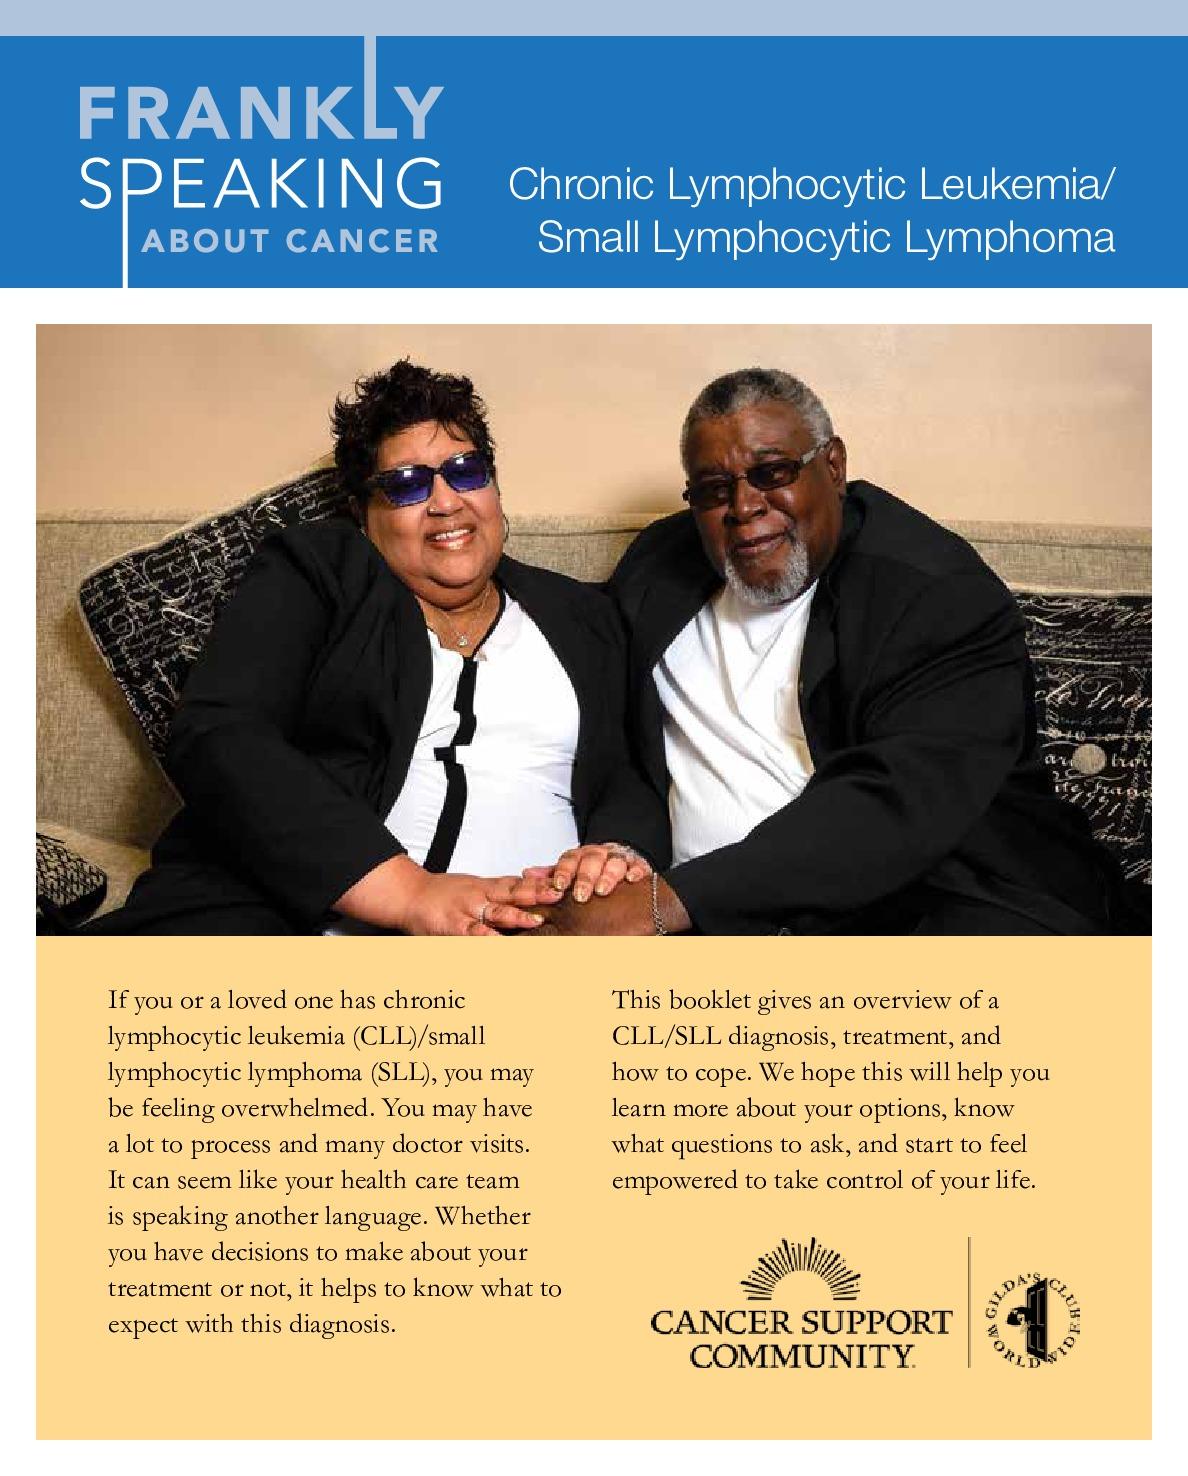 FSAC Chronic Lymphocytic Leukemia/Small Lymphocytic Lymphoma